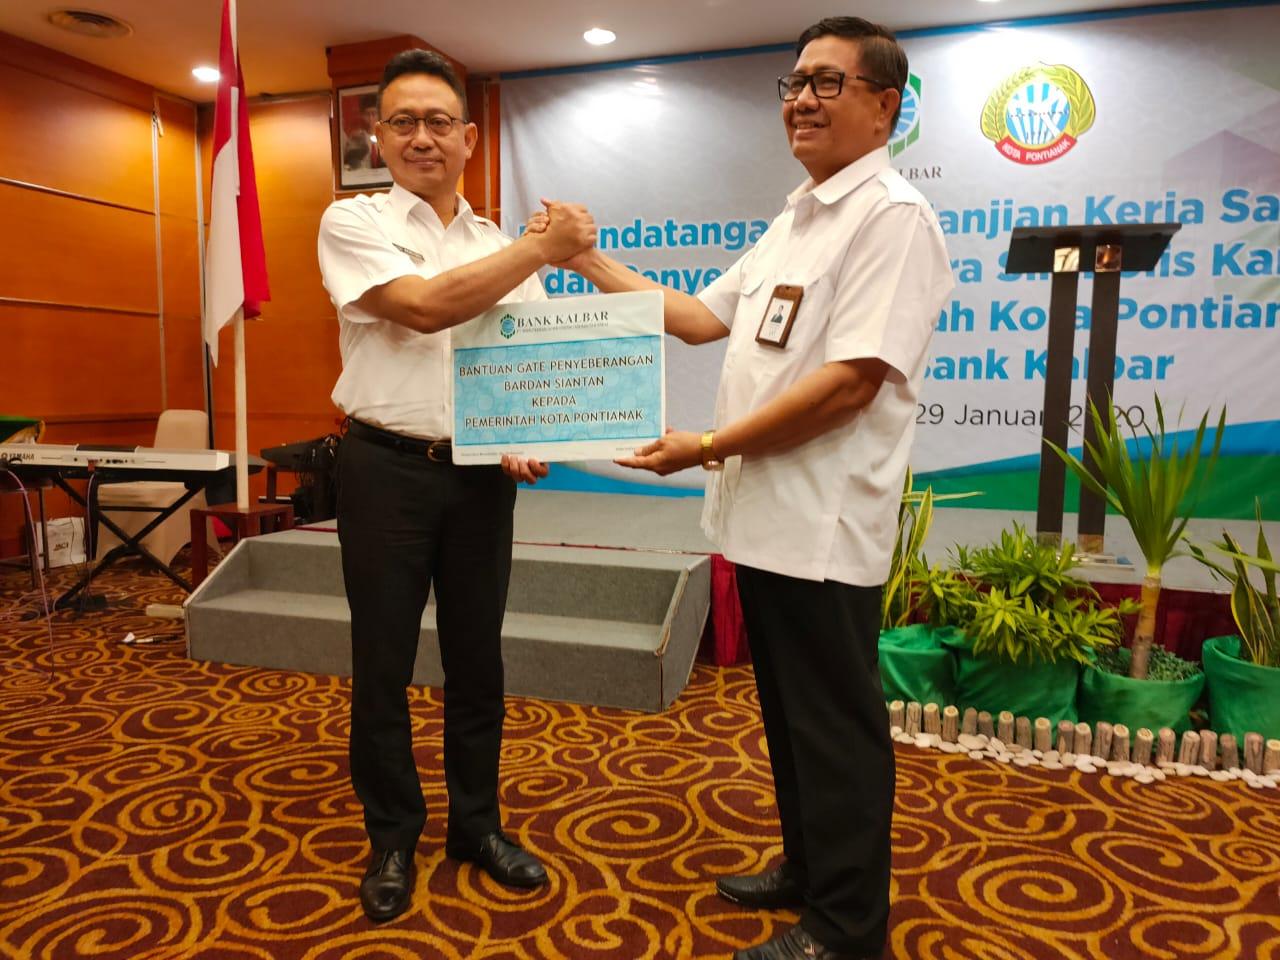 Wali Kota Pontianak Edi Kamtono dan Direktur Utama Bank Kalbar, Samsir Ismail